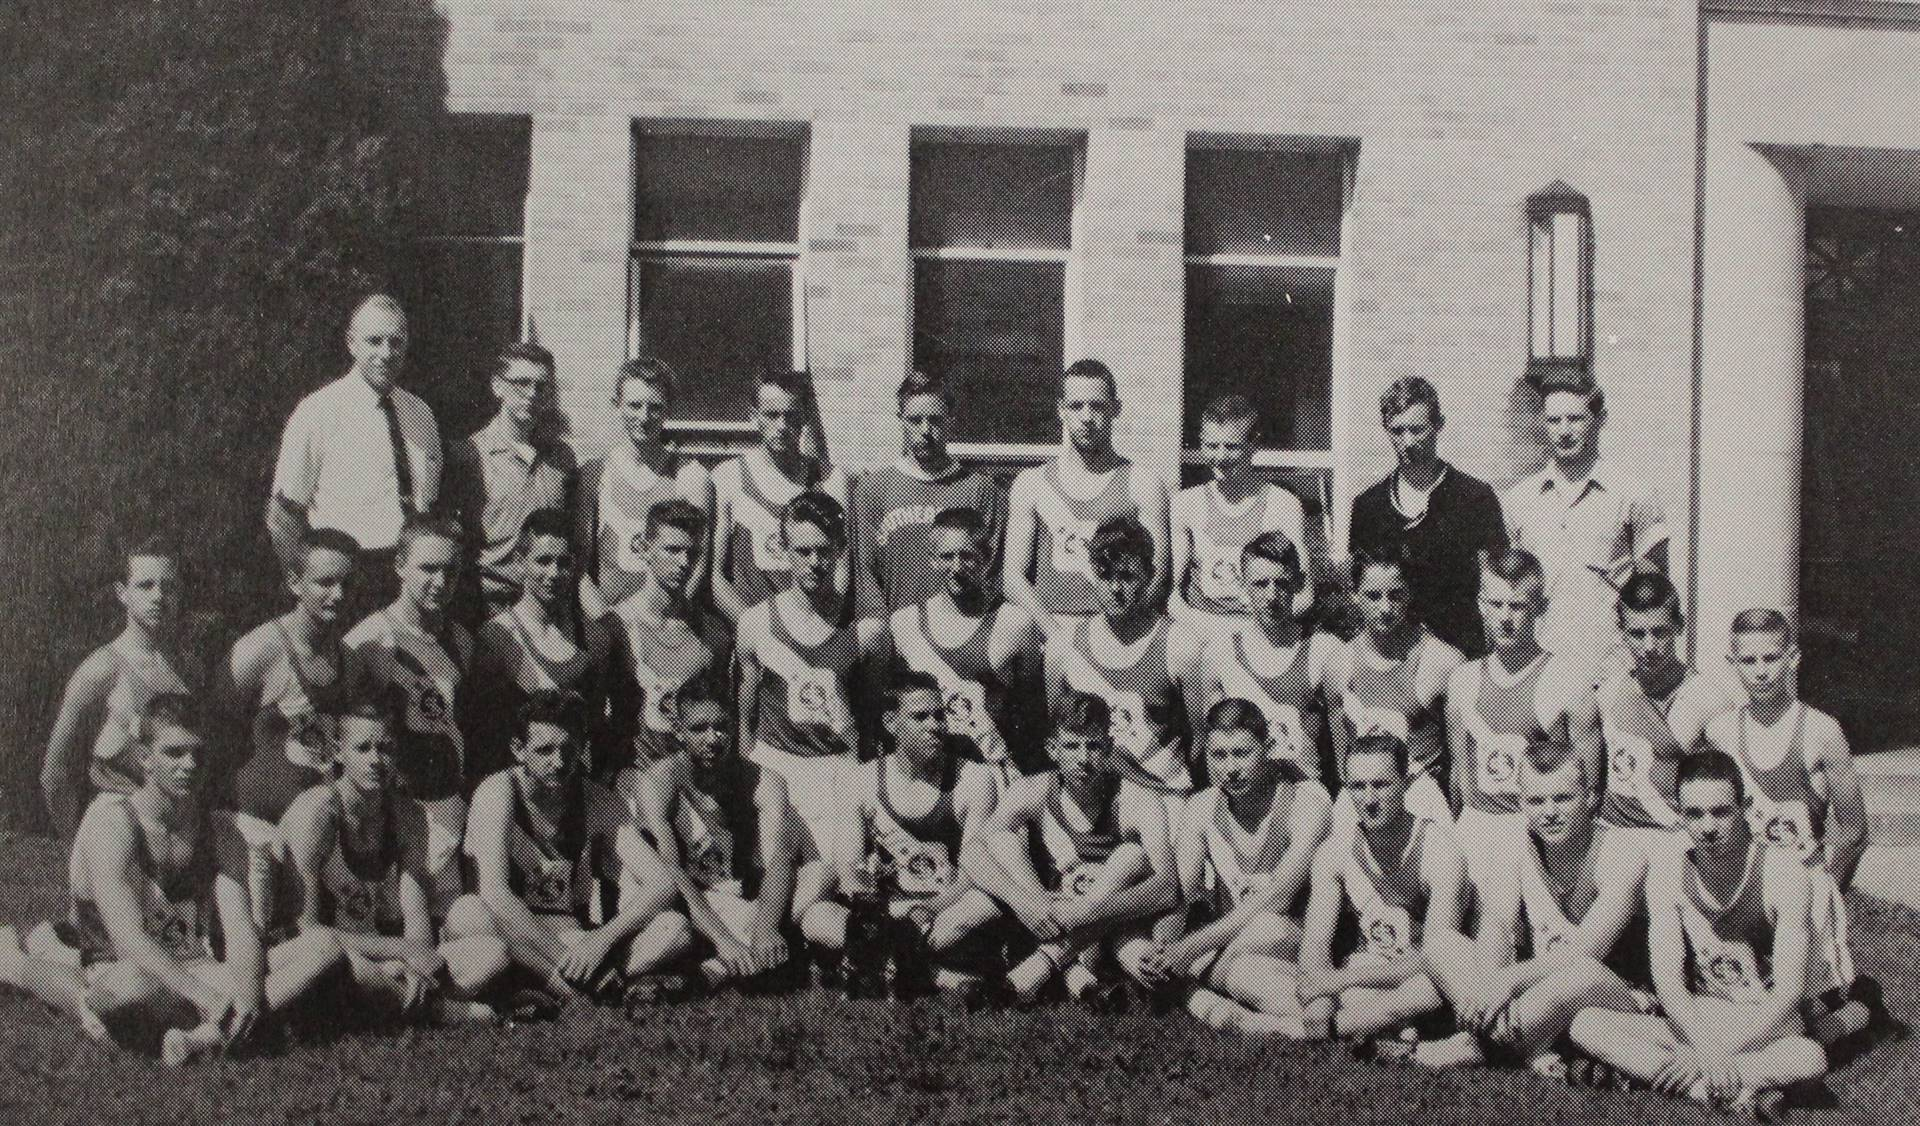 1963 Senior Track Team